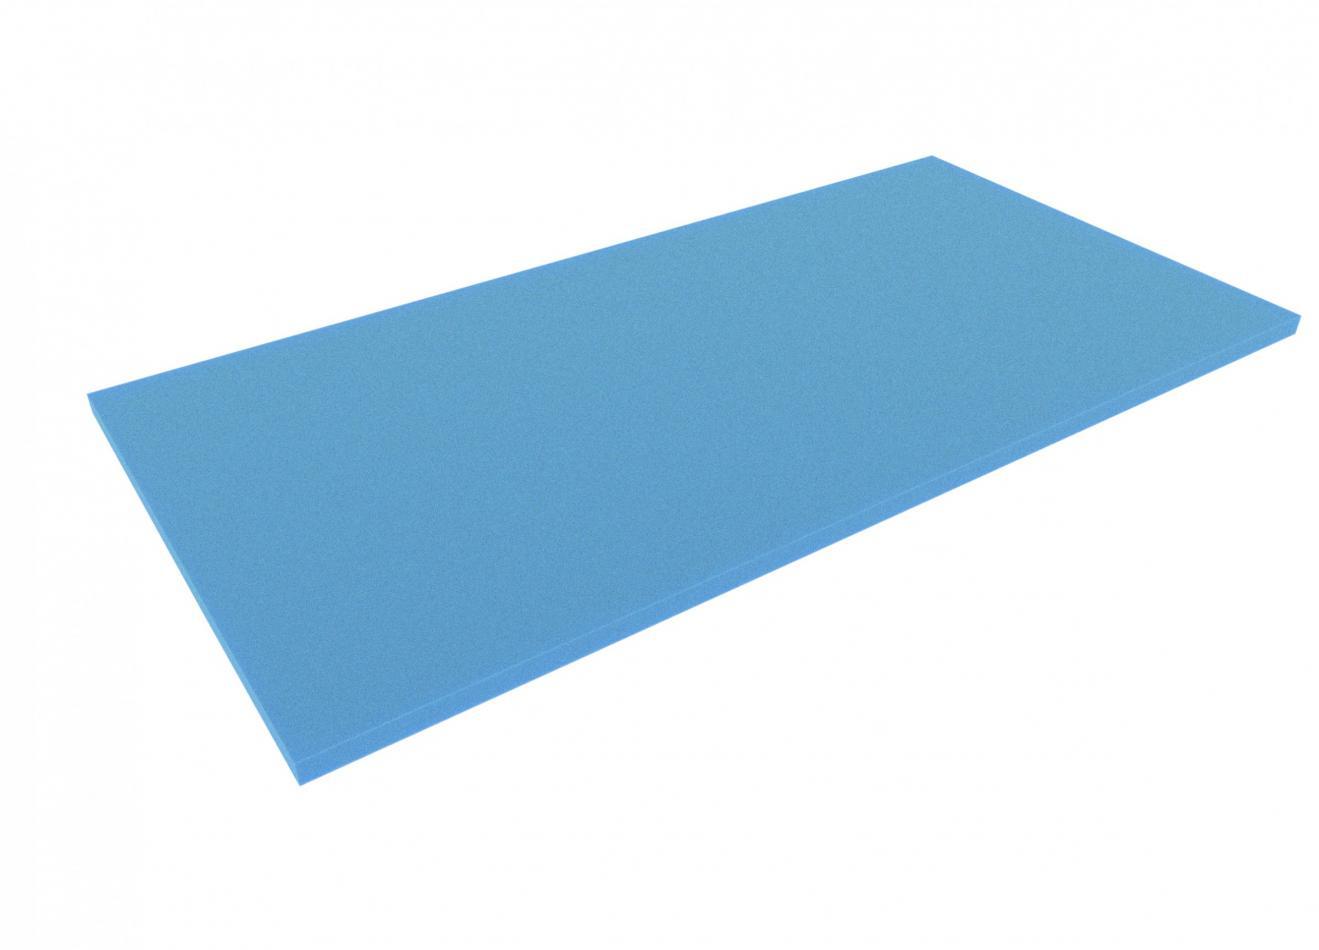 1000 mm x 500 mm x 20 mm foam sheet / cutting, blue